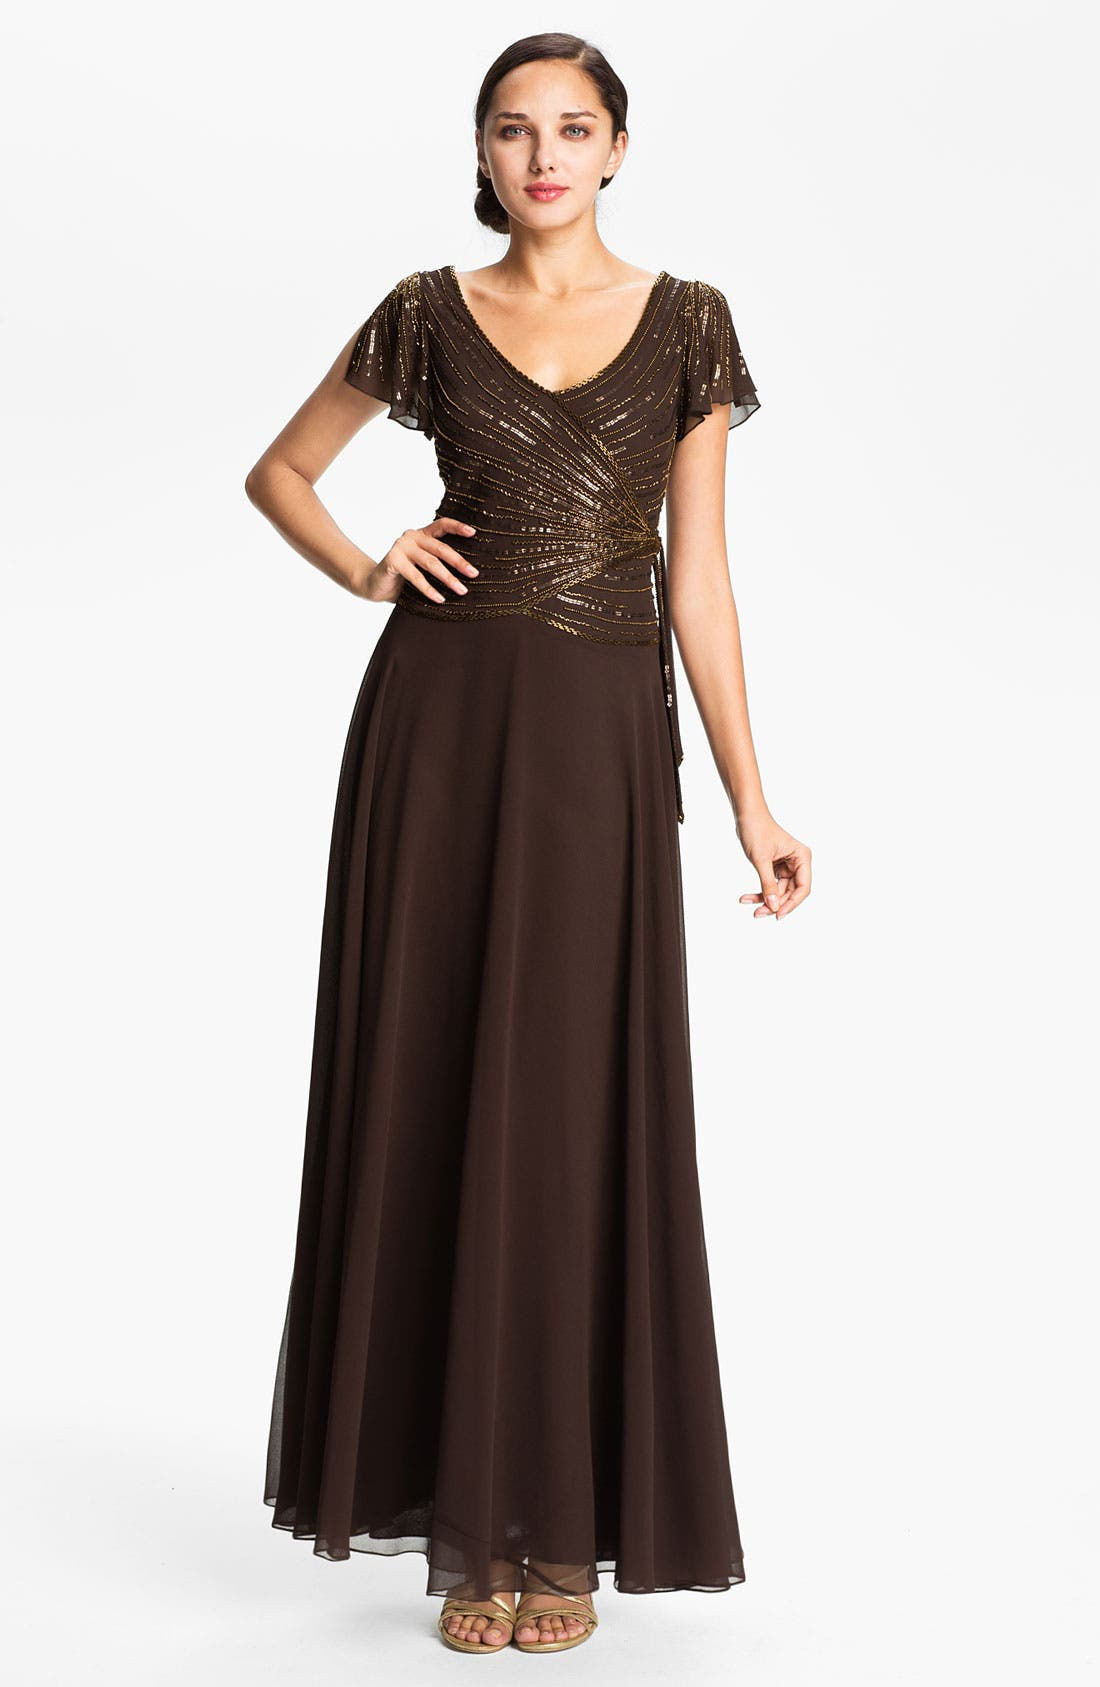 Alternate Image 1 Selected - J Kara Embellished V-Neck Bodice Chiffon Gown